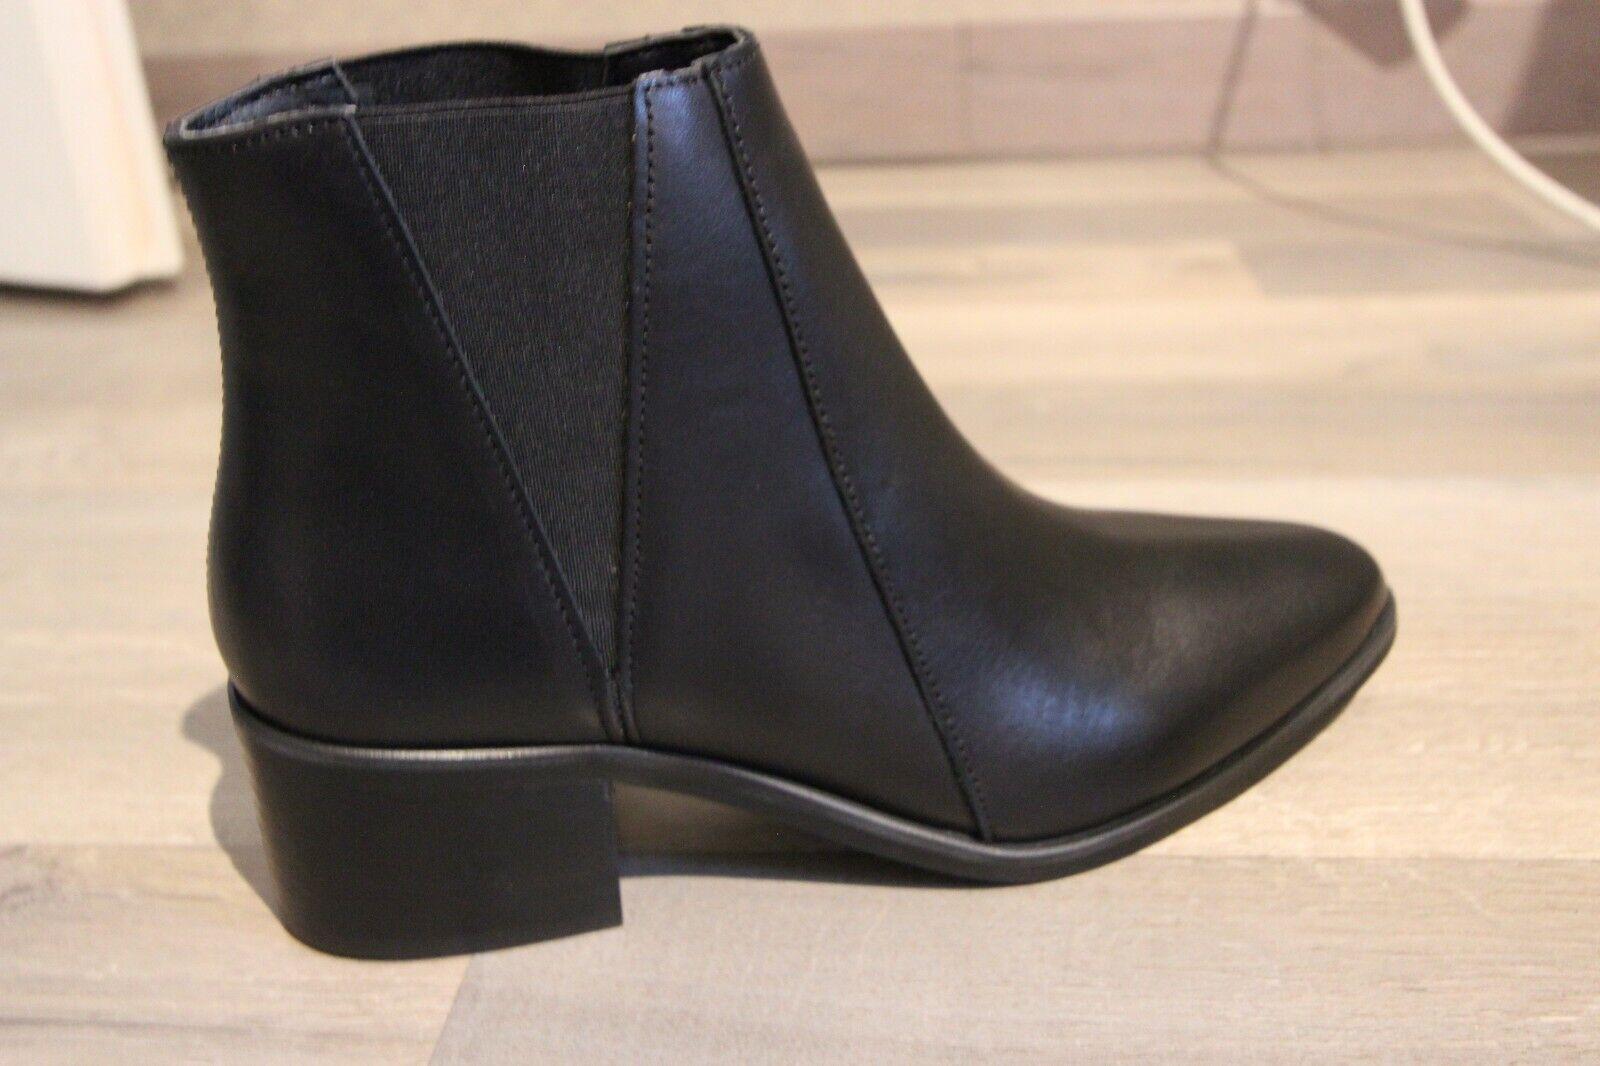 ANNA FIELD Bottes basses cuir noires à enfiler Taille 38